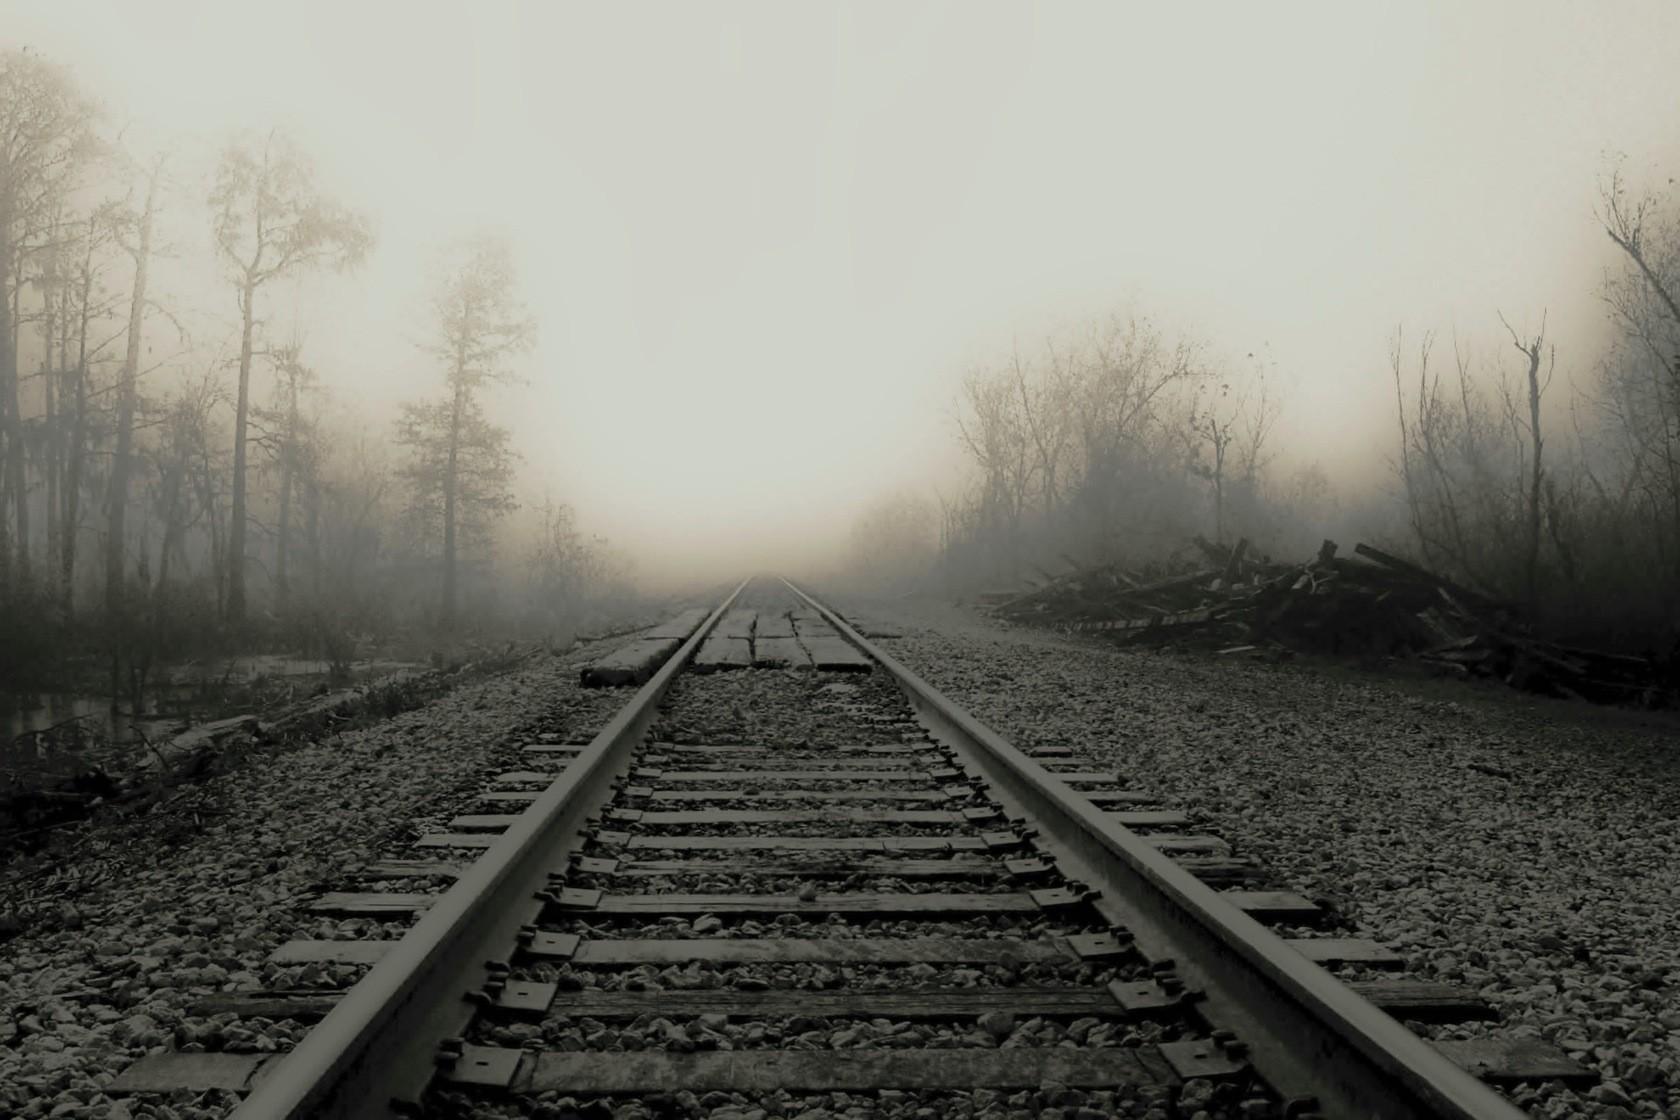 trains fog railroad tracks vehicles train rails HD Wallpaper of Anime 1680x1120